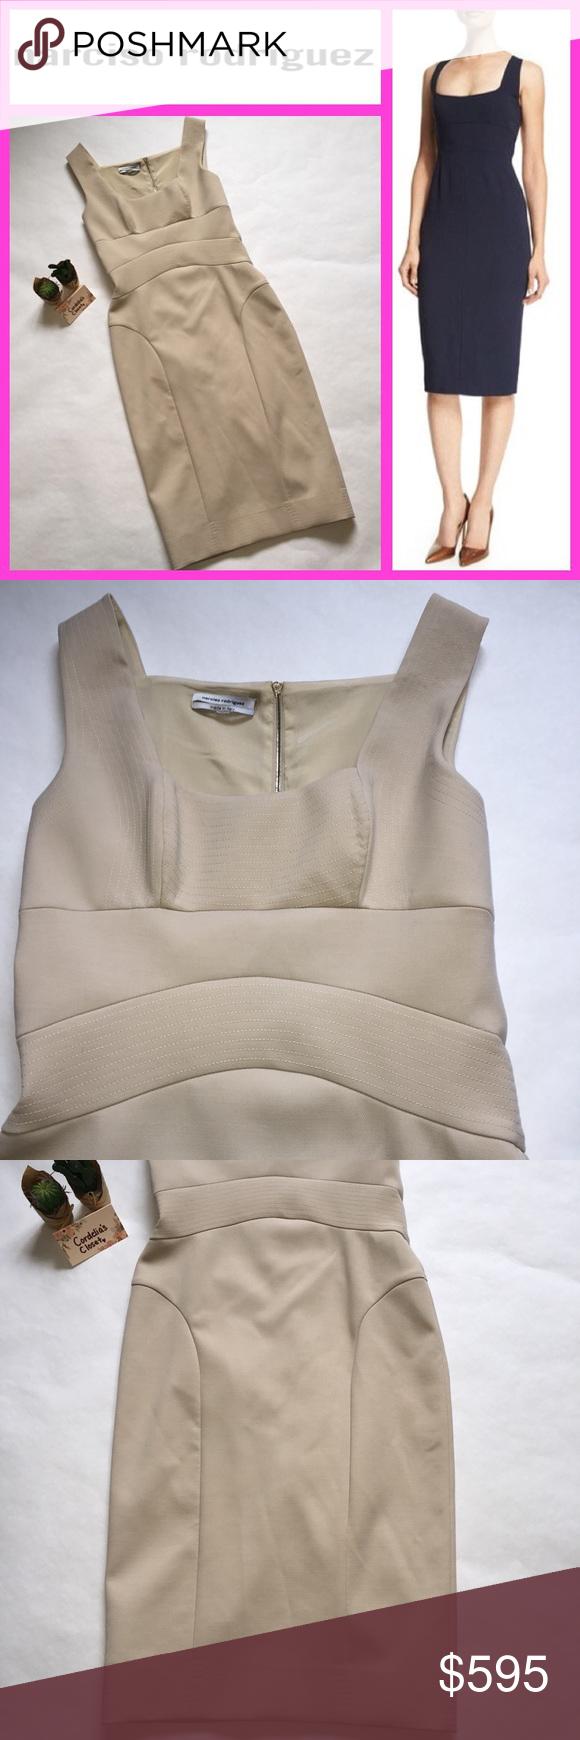 9b9039bf3b9c Narciso Rodriguez Bodycon Crepe Sheath Nude Dress • name brand: Narciso  Rodriguez • style #